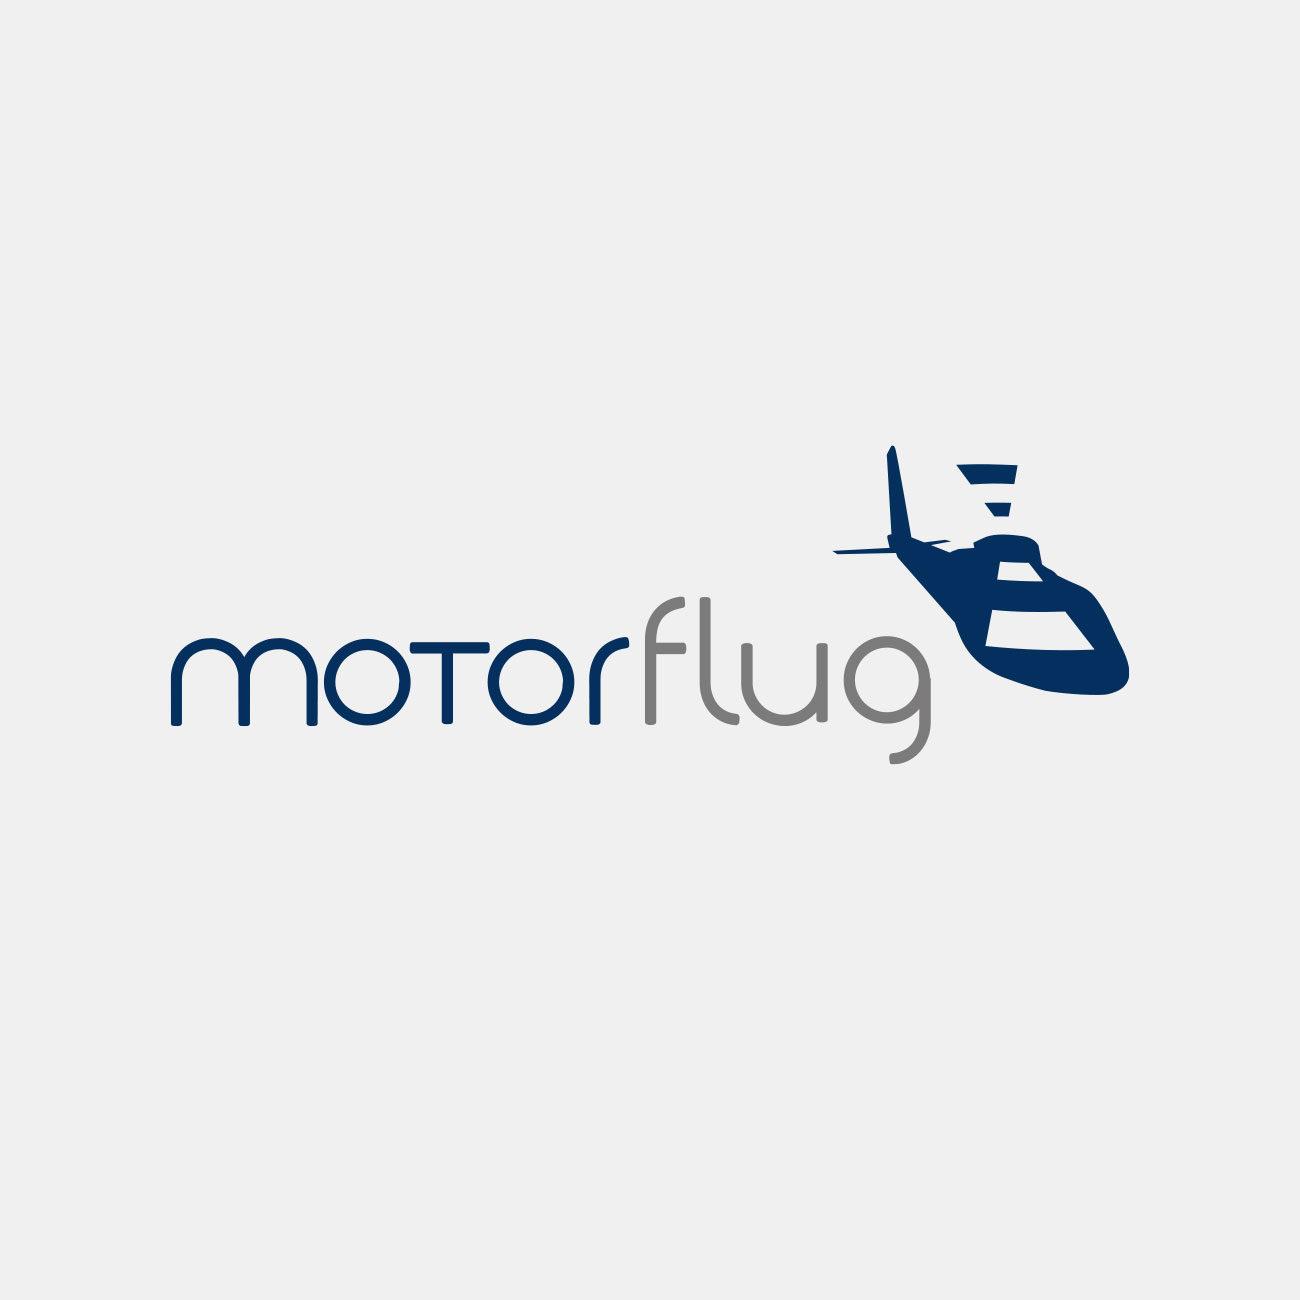 Motorflug Logodesign